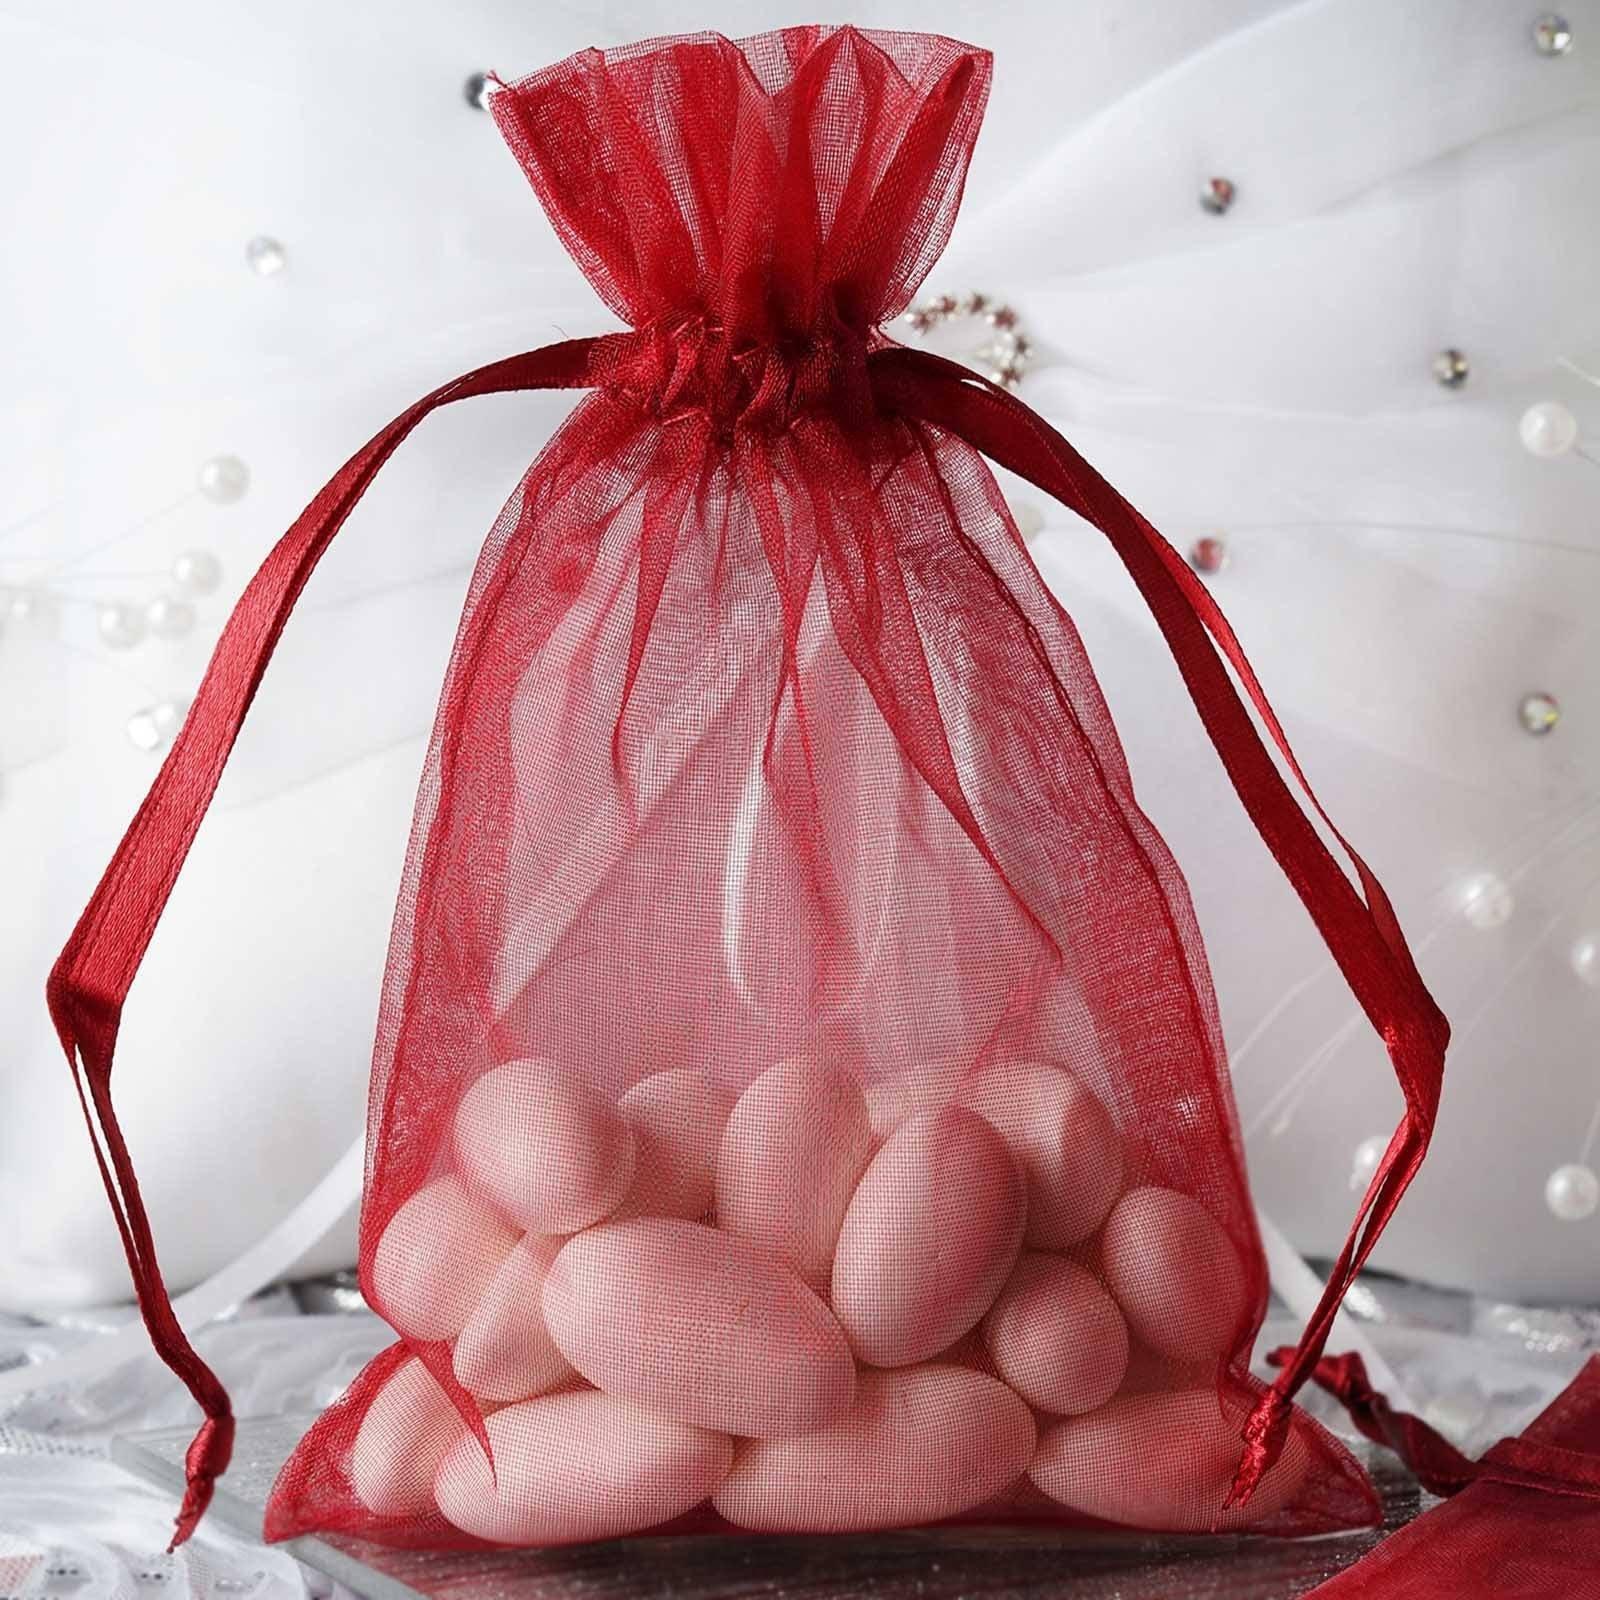 50 Burgundy 4X6 Organza Bags Sheer Favor Bags Wedding Favor   Etsy